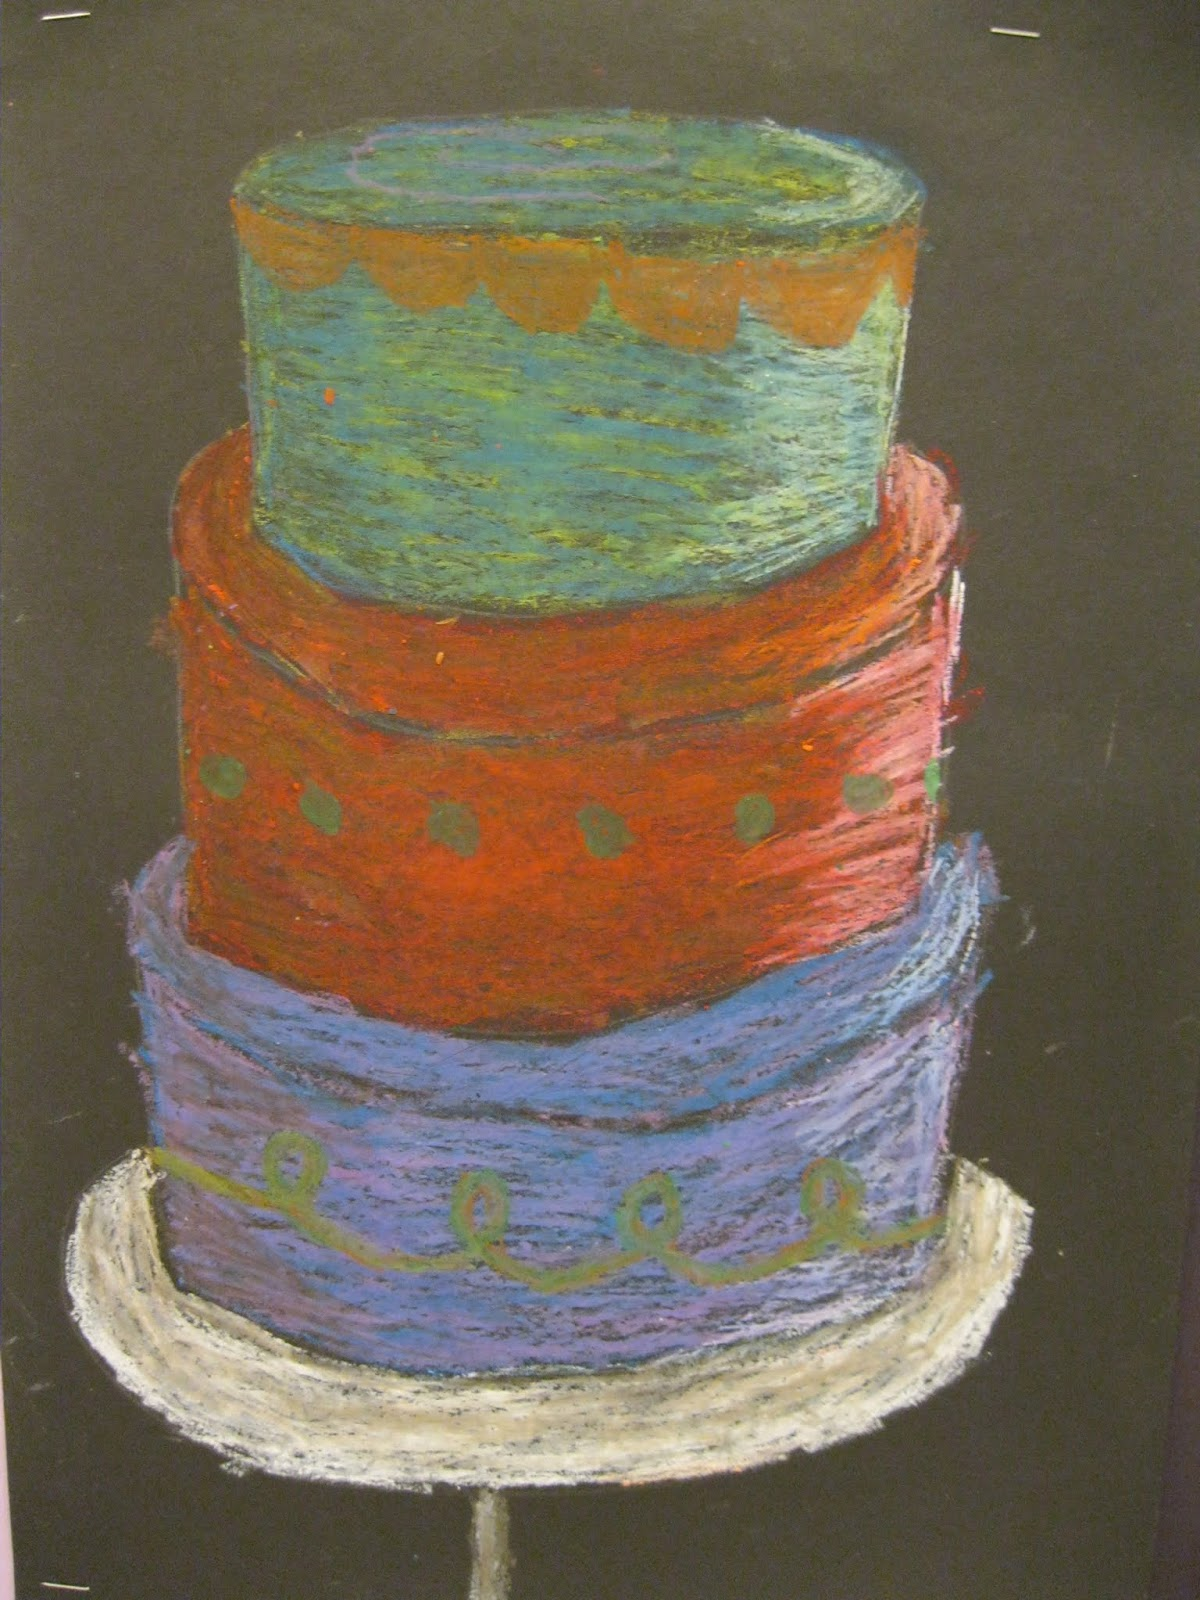 The Art of Creativity Wayne Thiebaud Cakes